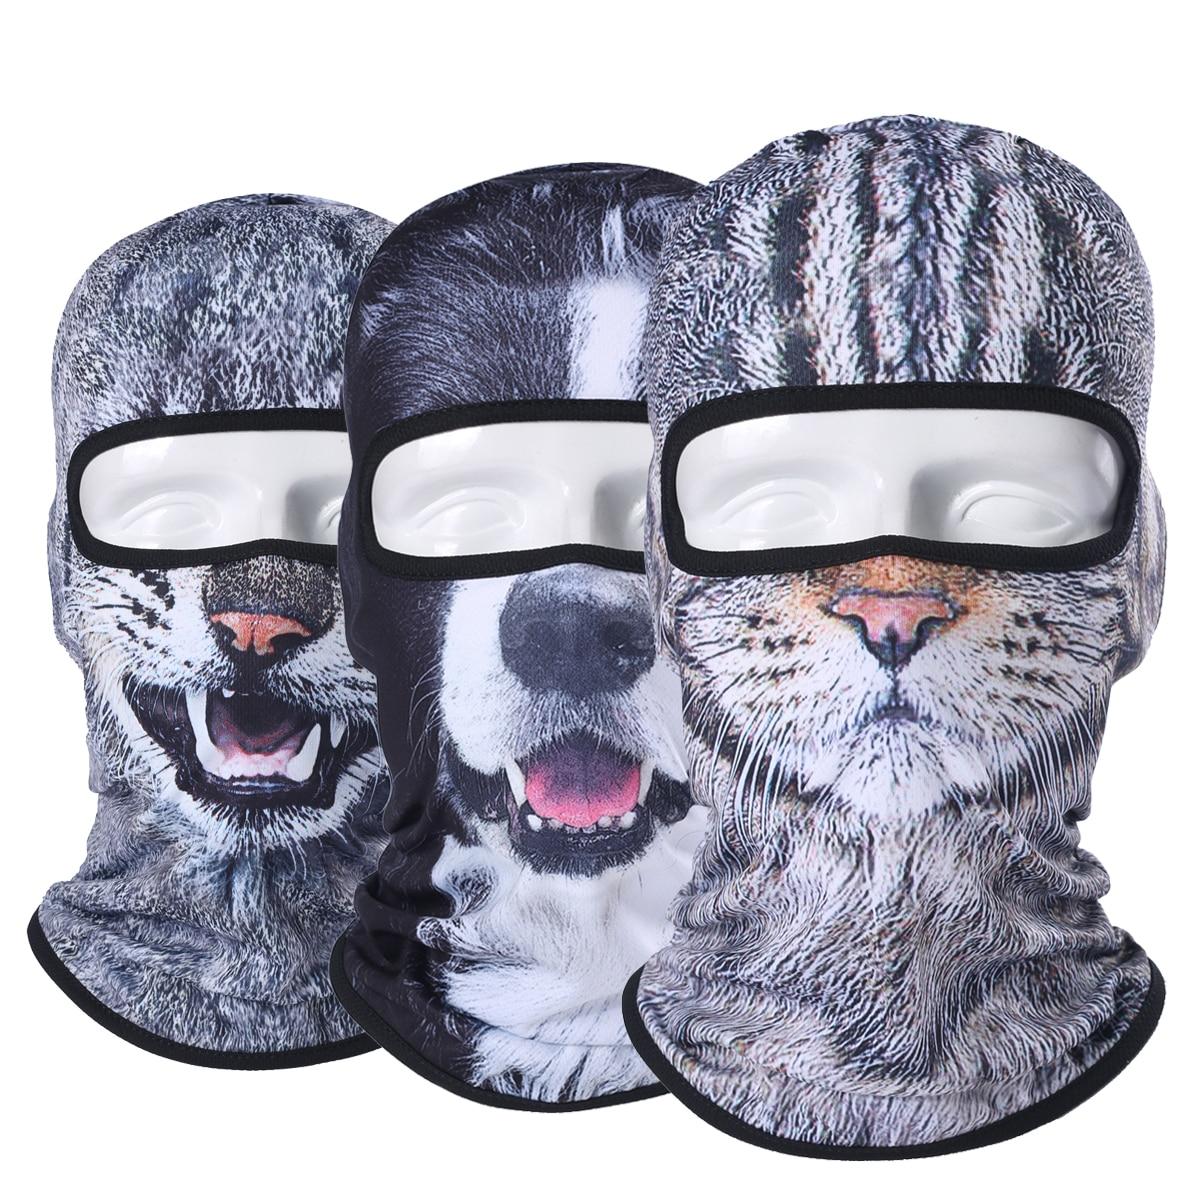 premium 3d animal balaclava full face mask windproof bicycle hats halloween cat dog - Premium Halloween Masks